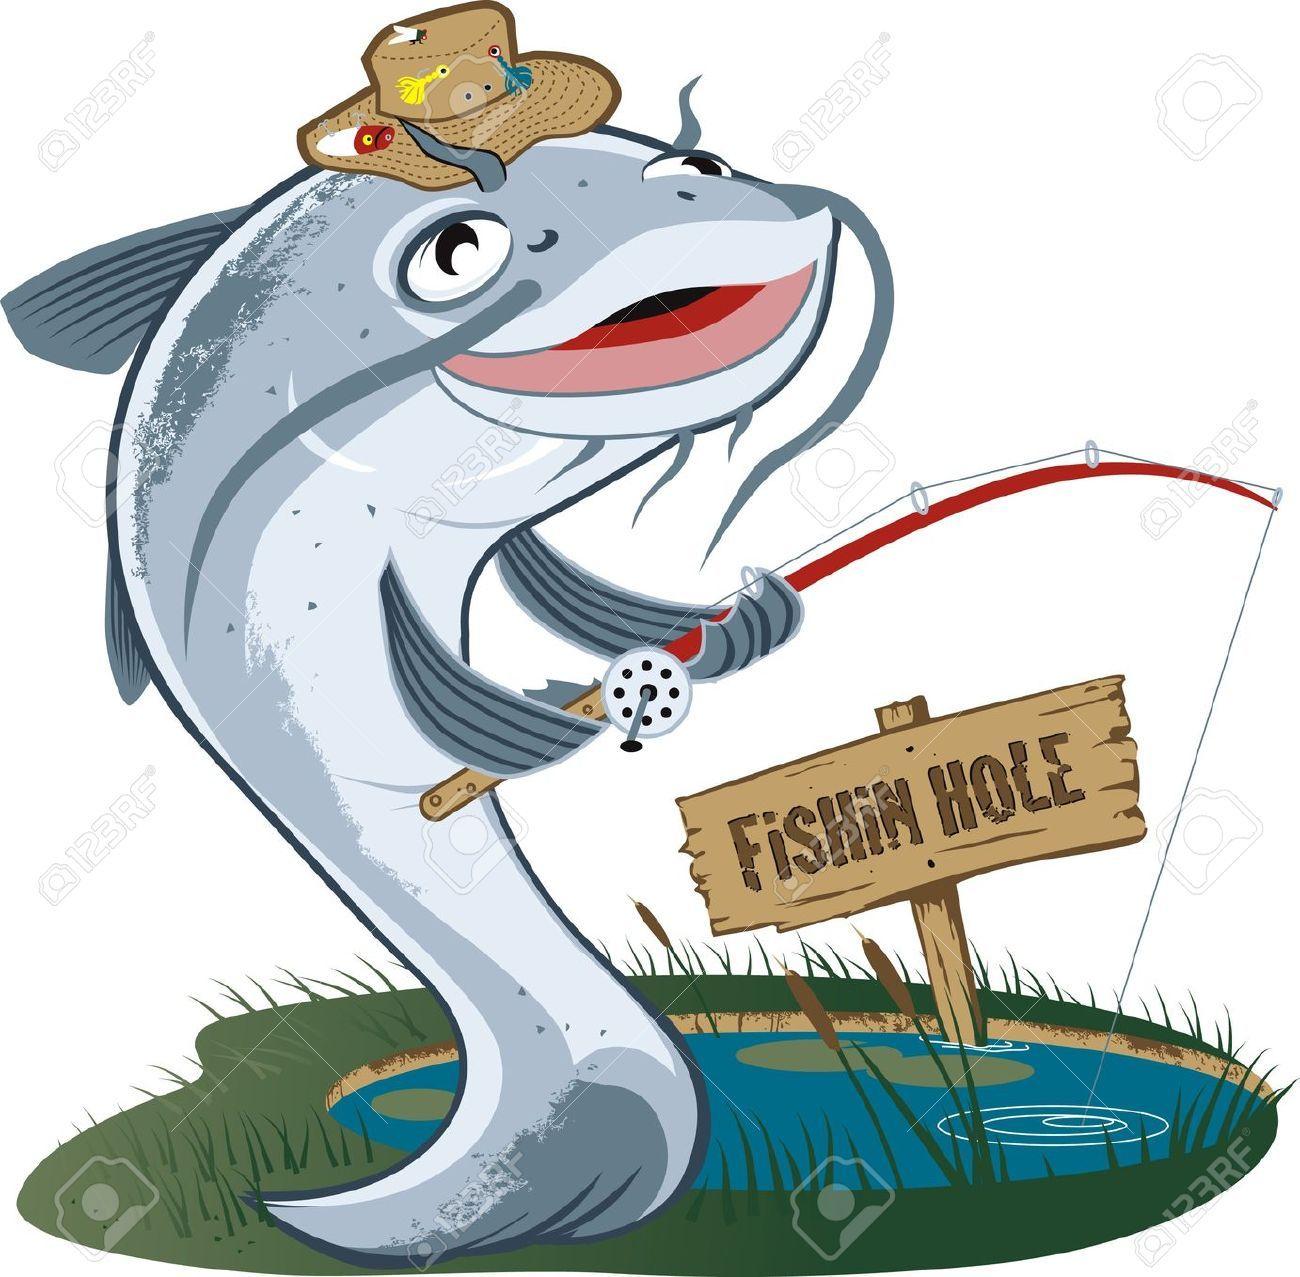 Catfish Stock Vector Illustration And Royalty Free Catfish.